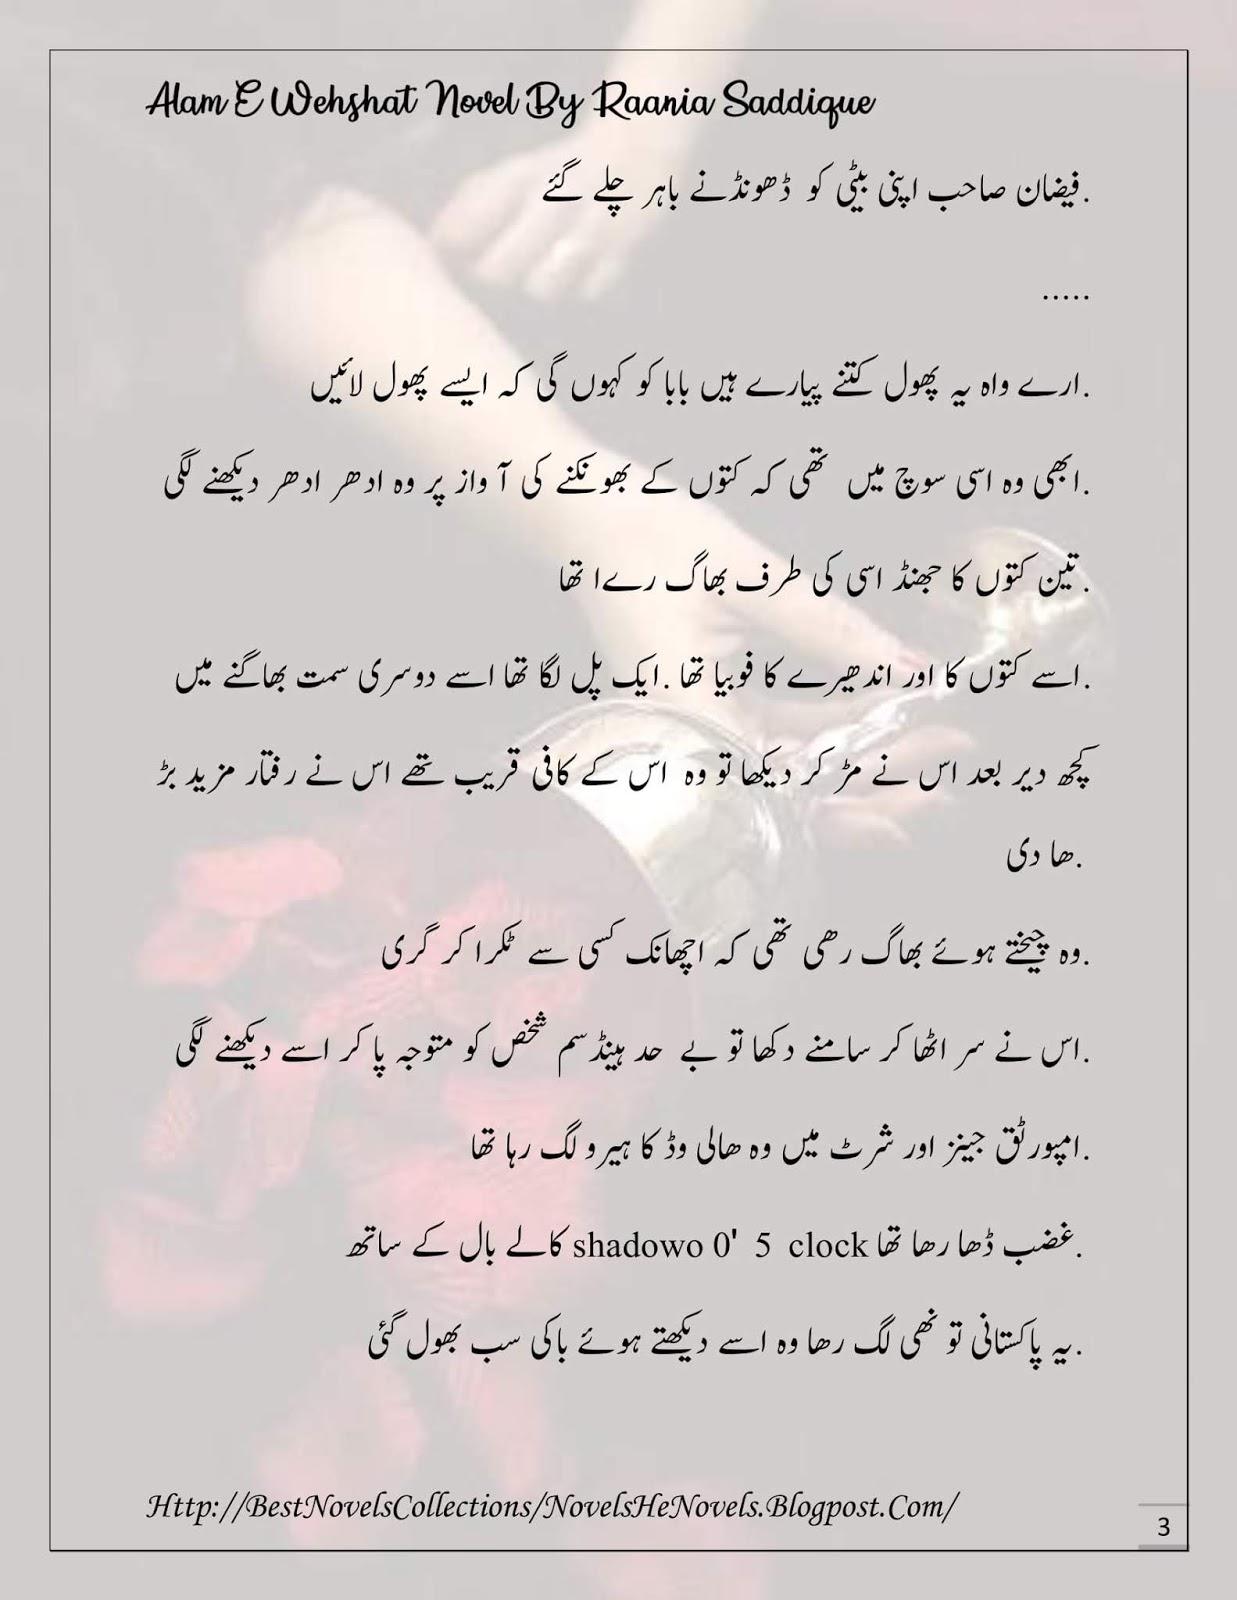 🎉 Urdu romantic novel in which hero kidnaps the heroine for